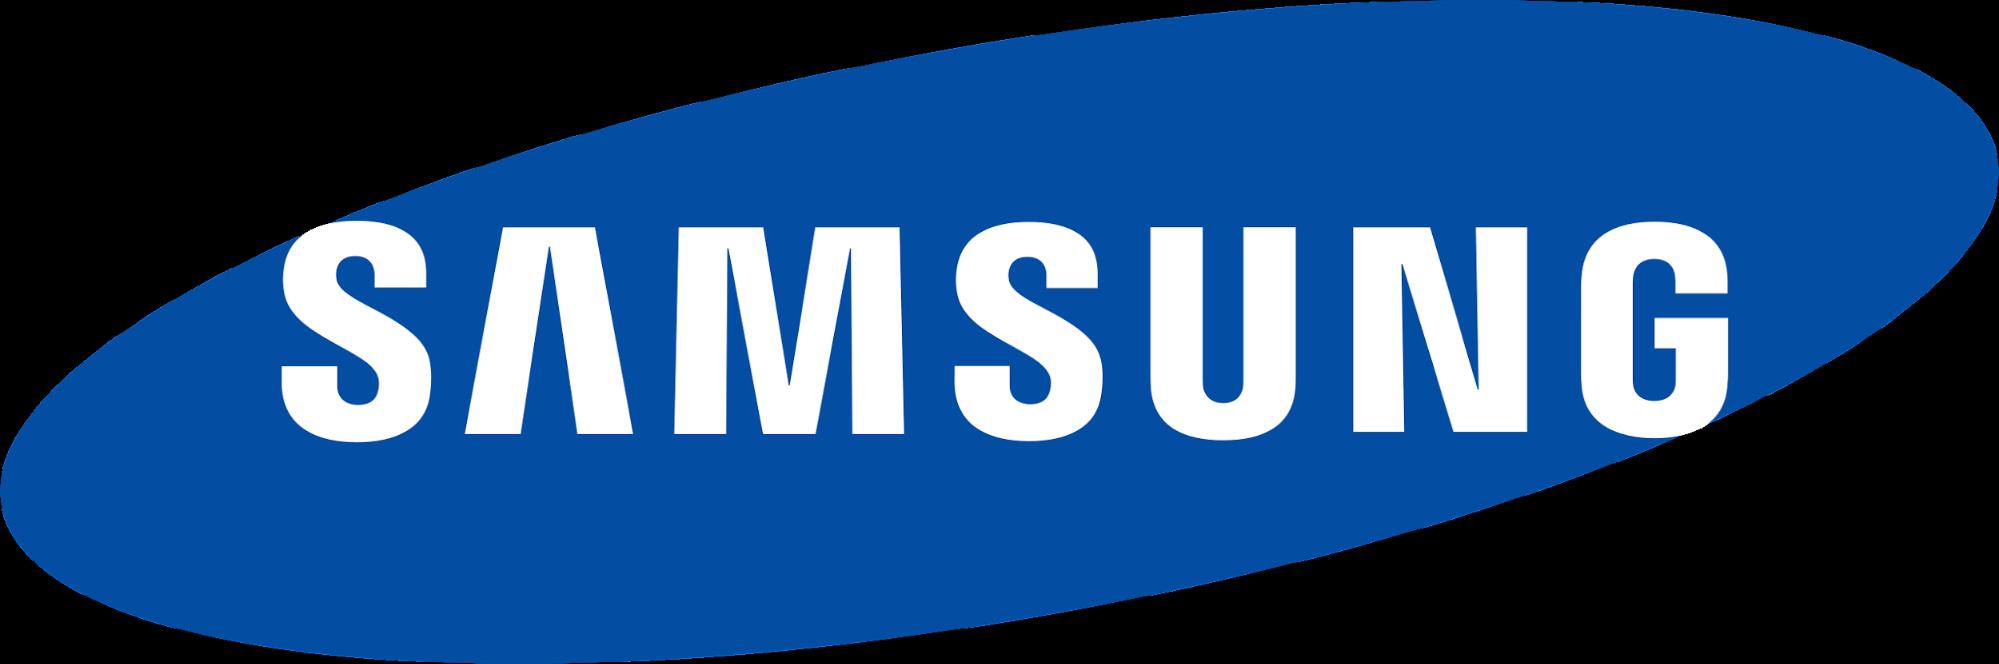 brand logo of Samsung -Marketing strategy of Samsung  IIDE